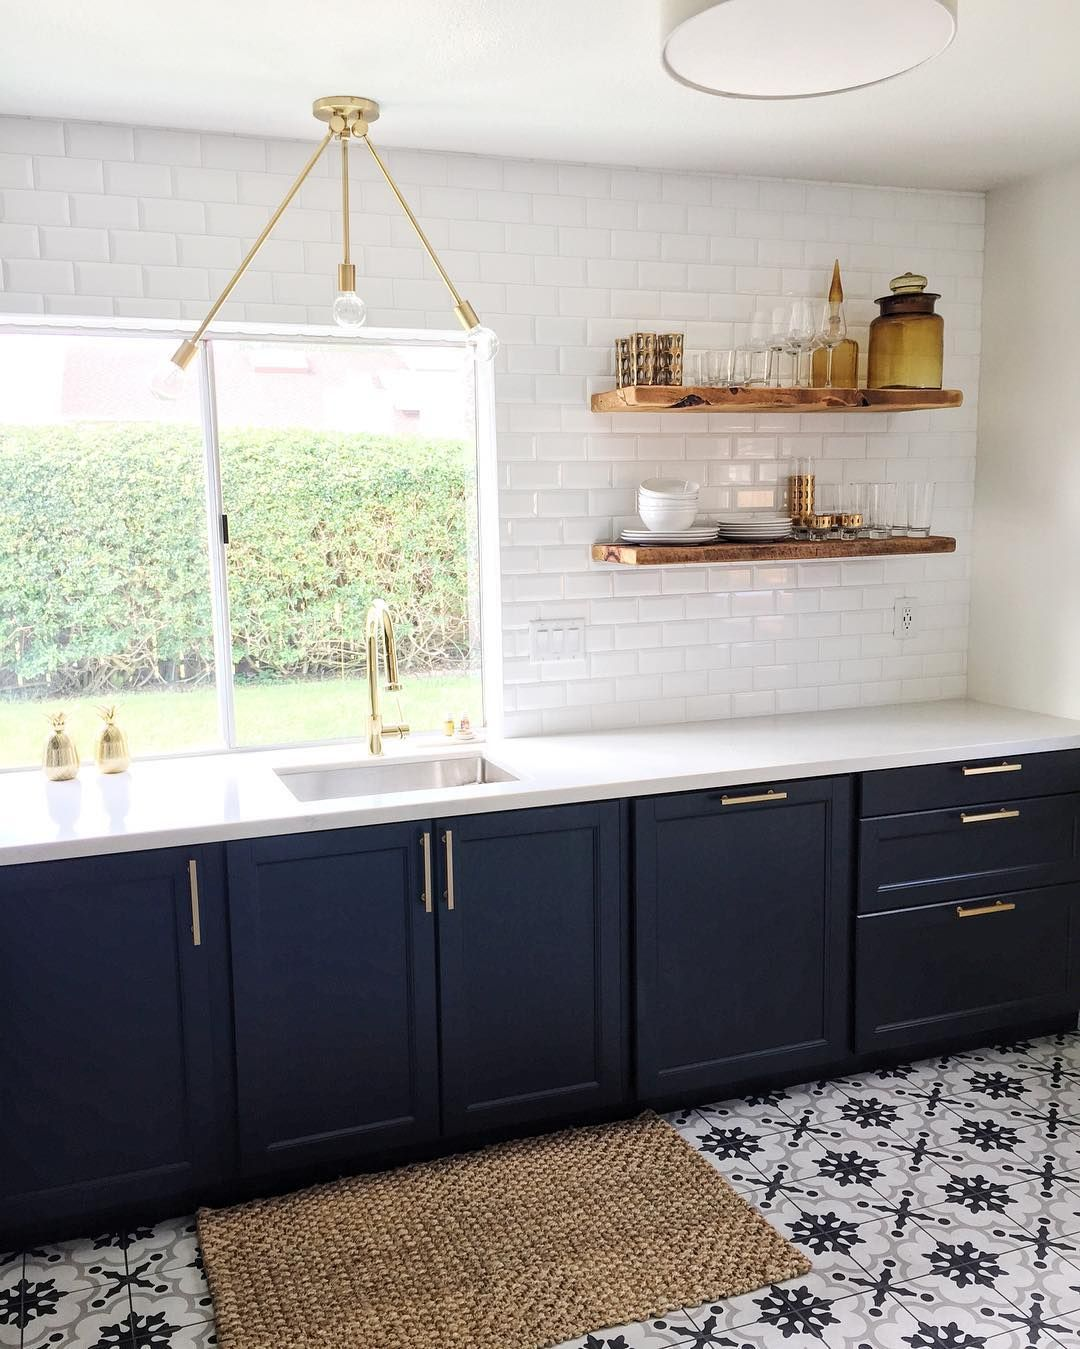 Semihandmade To Ikea Cabinets Ikea Kitchen Design New Kitchen Cabinets Blue Kitchen Cabinets